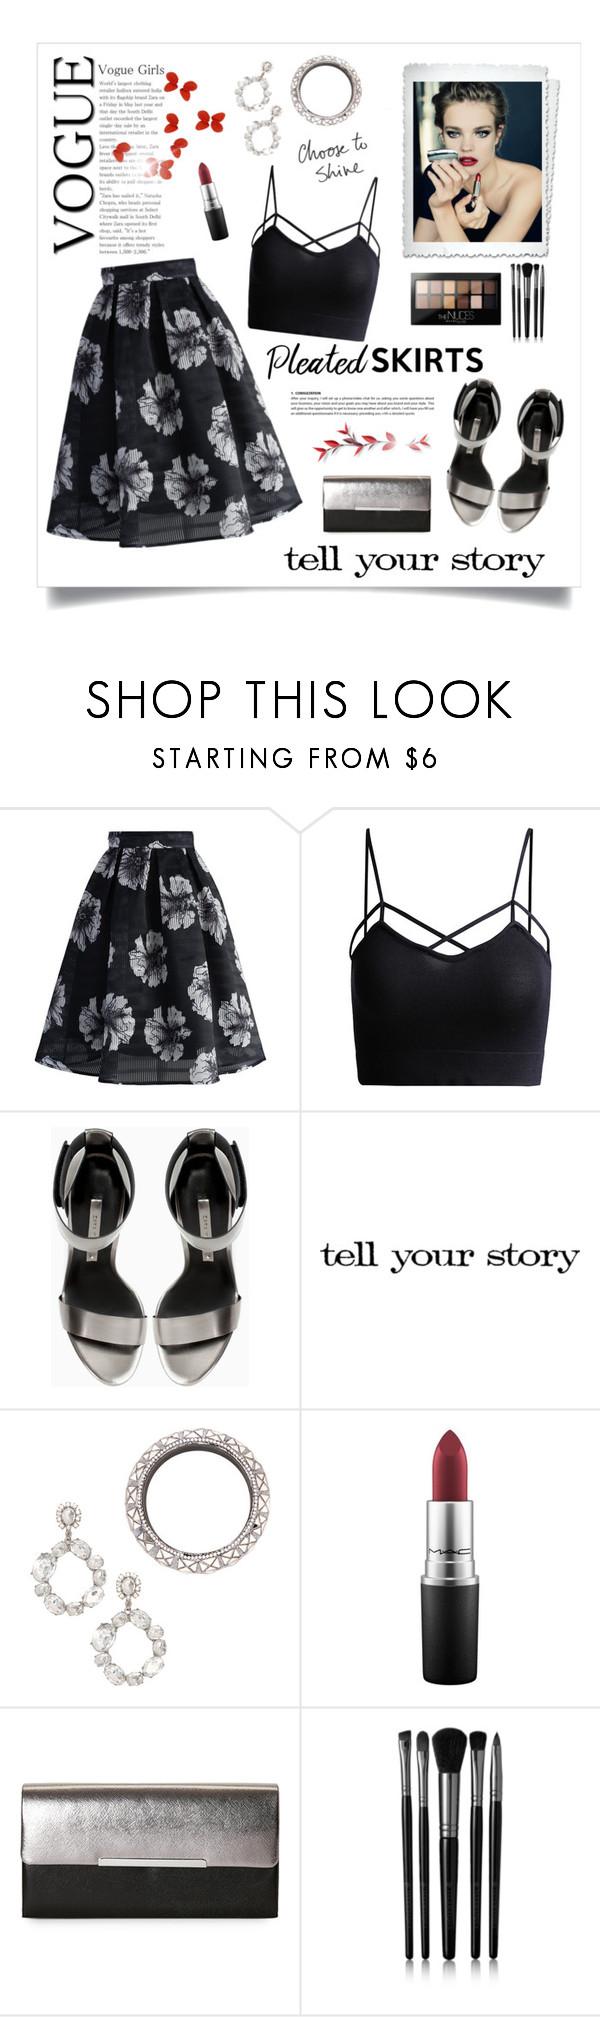 """Pleated Skirt!"" by diane1234 ❤ liked on Polyvore featuring Chicwish, Guerlain, Zara, JustFab, MAC Cosmetics, La Regale, Illamasqua and Maybelline"